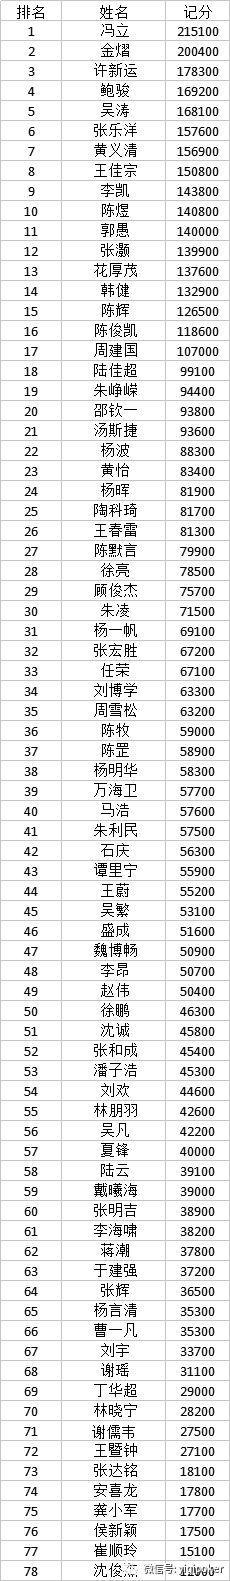 2018CPG上海站DAY1A组战罢 冯立领衔78人晋级